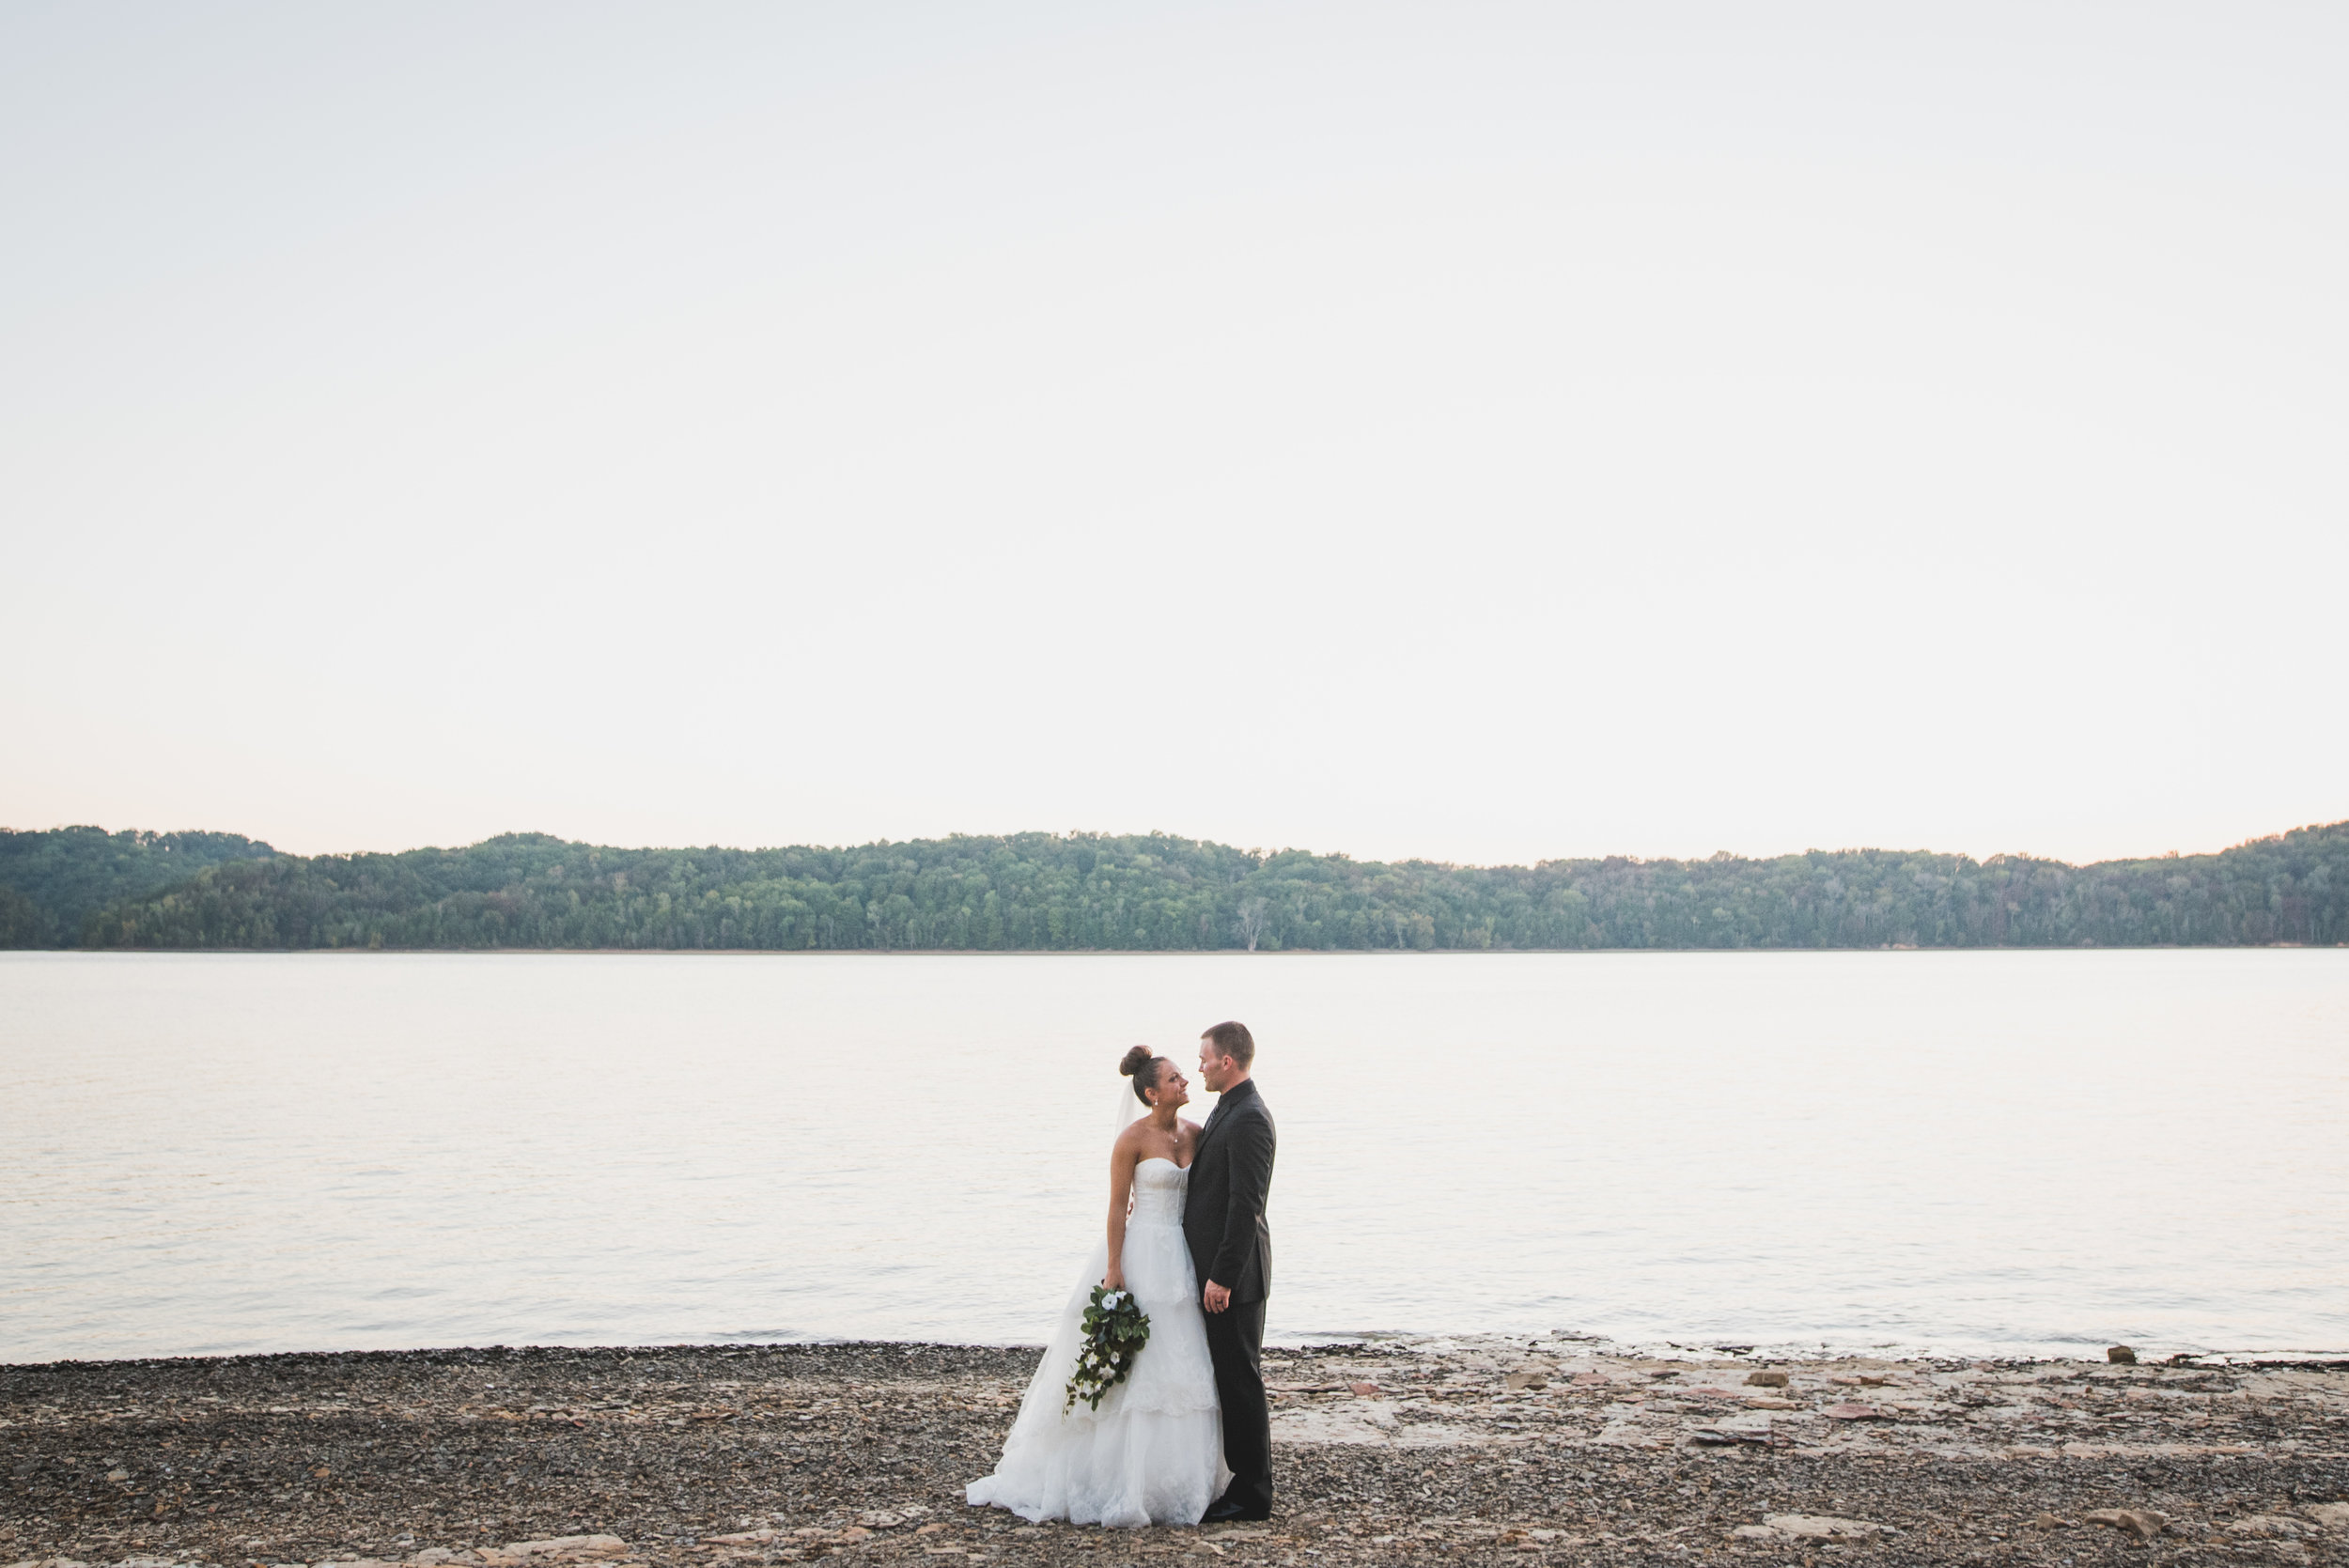 Nashville-Wedding-Photographer-Favorites19.jpg